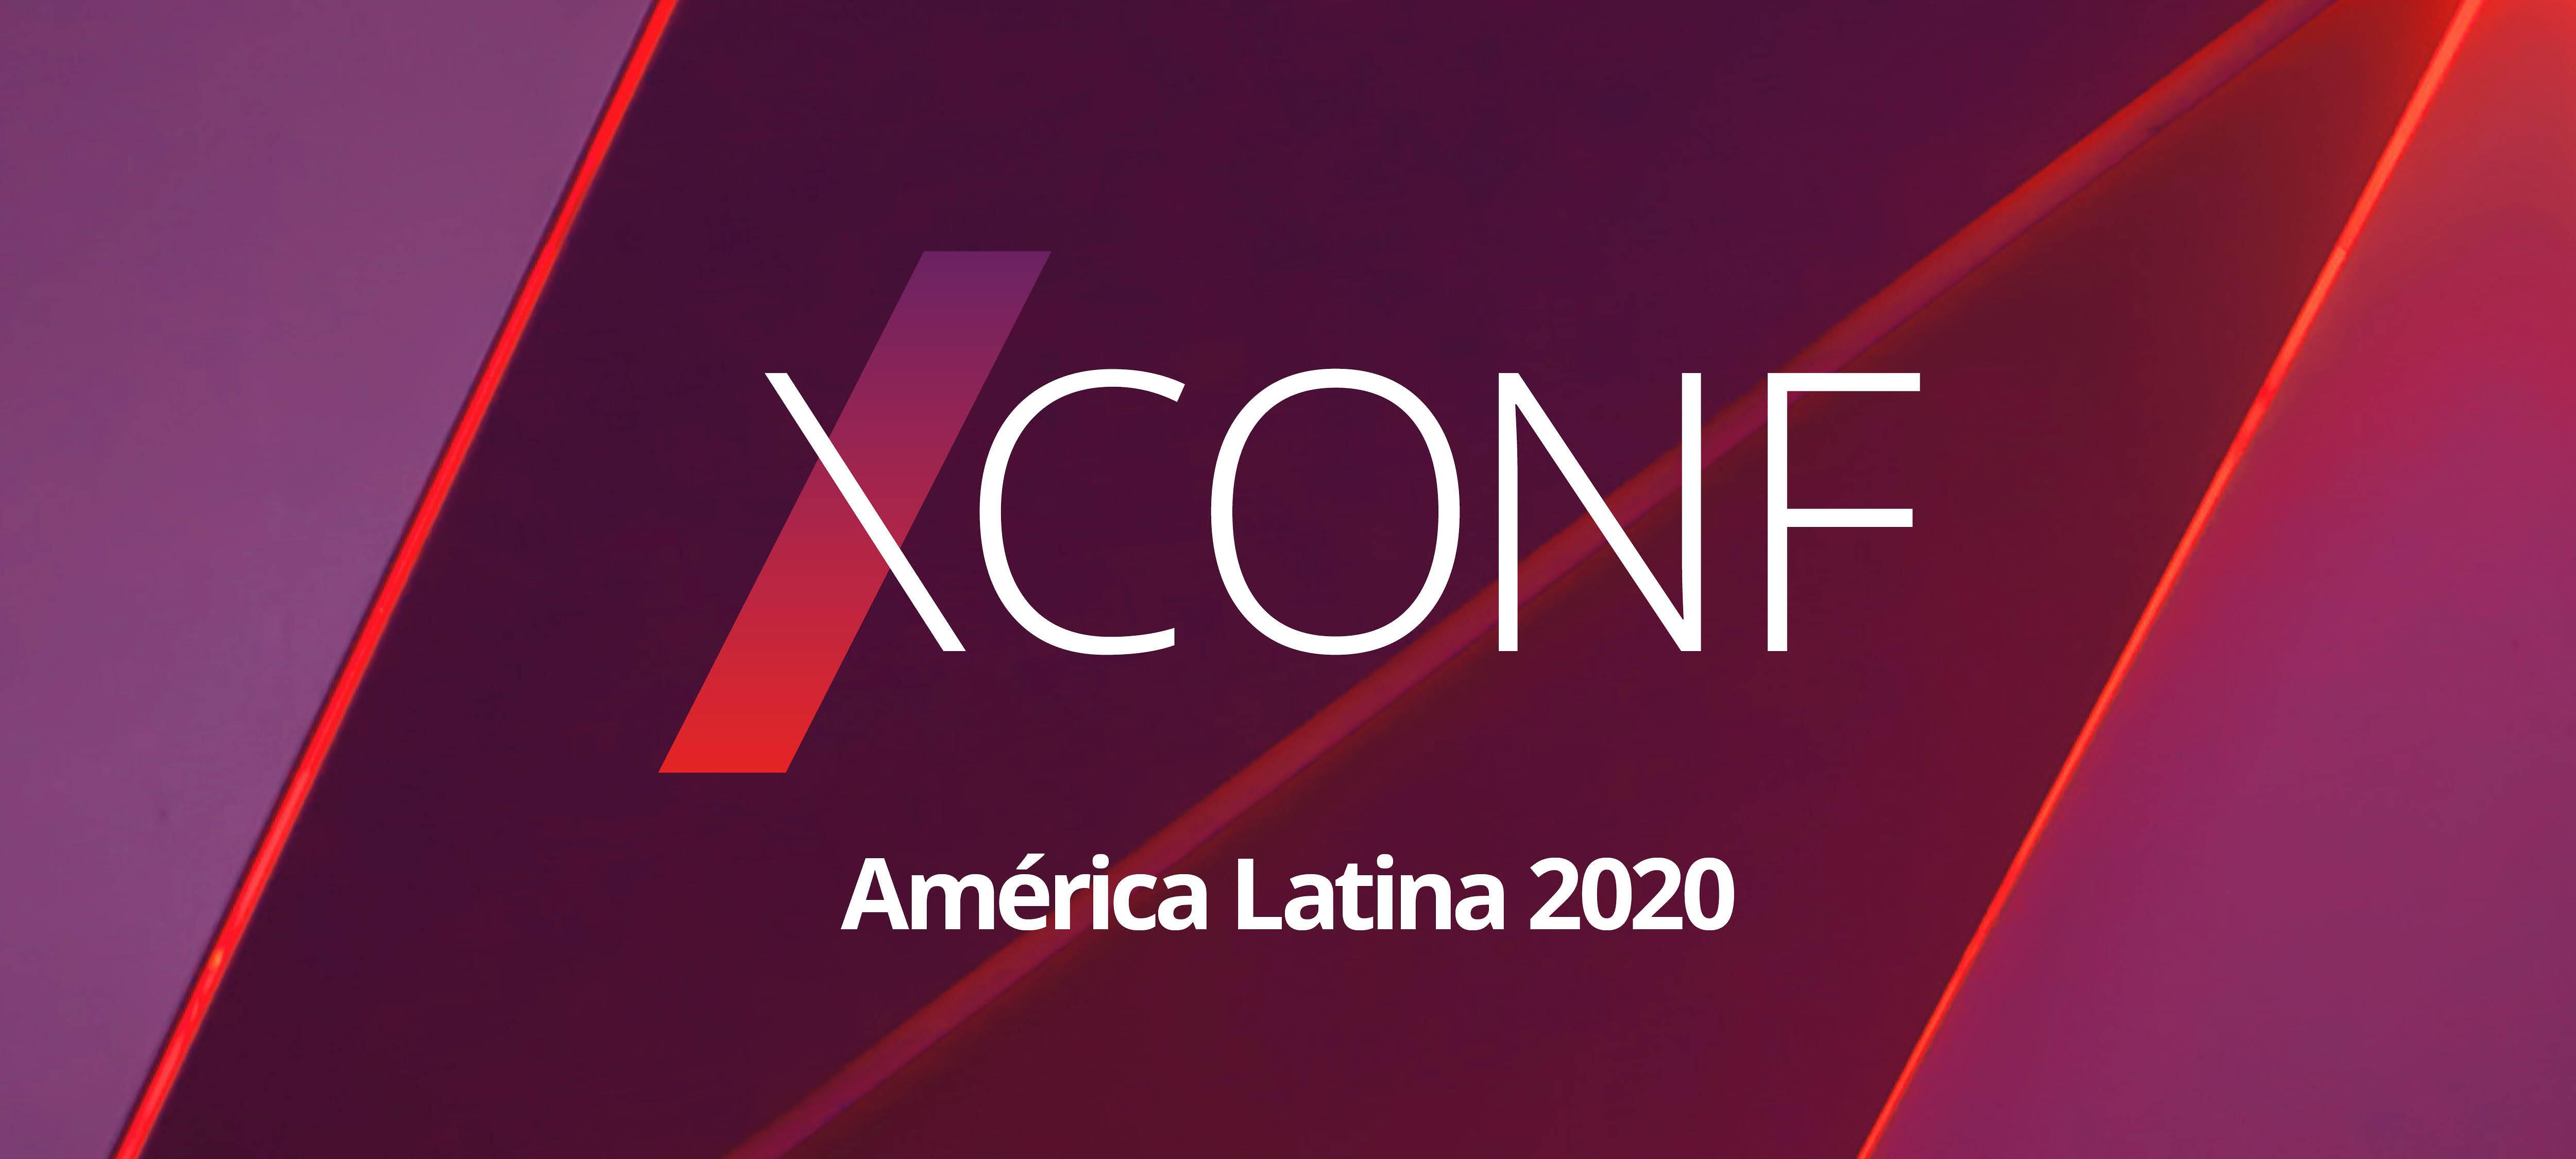 Xconf América Latina | Online 2020